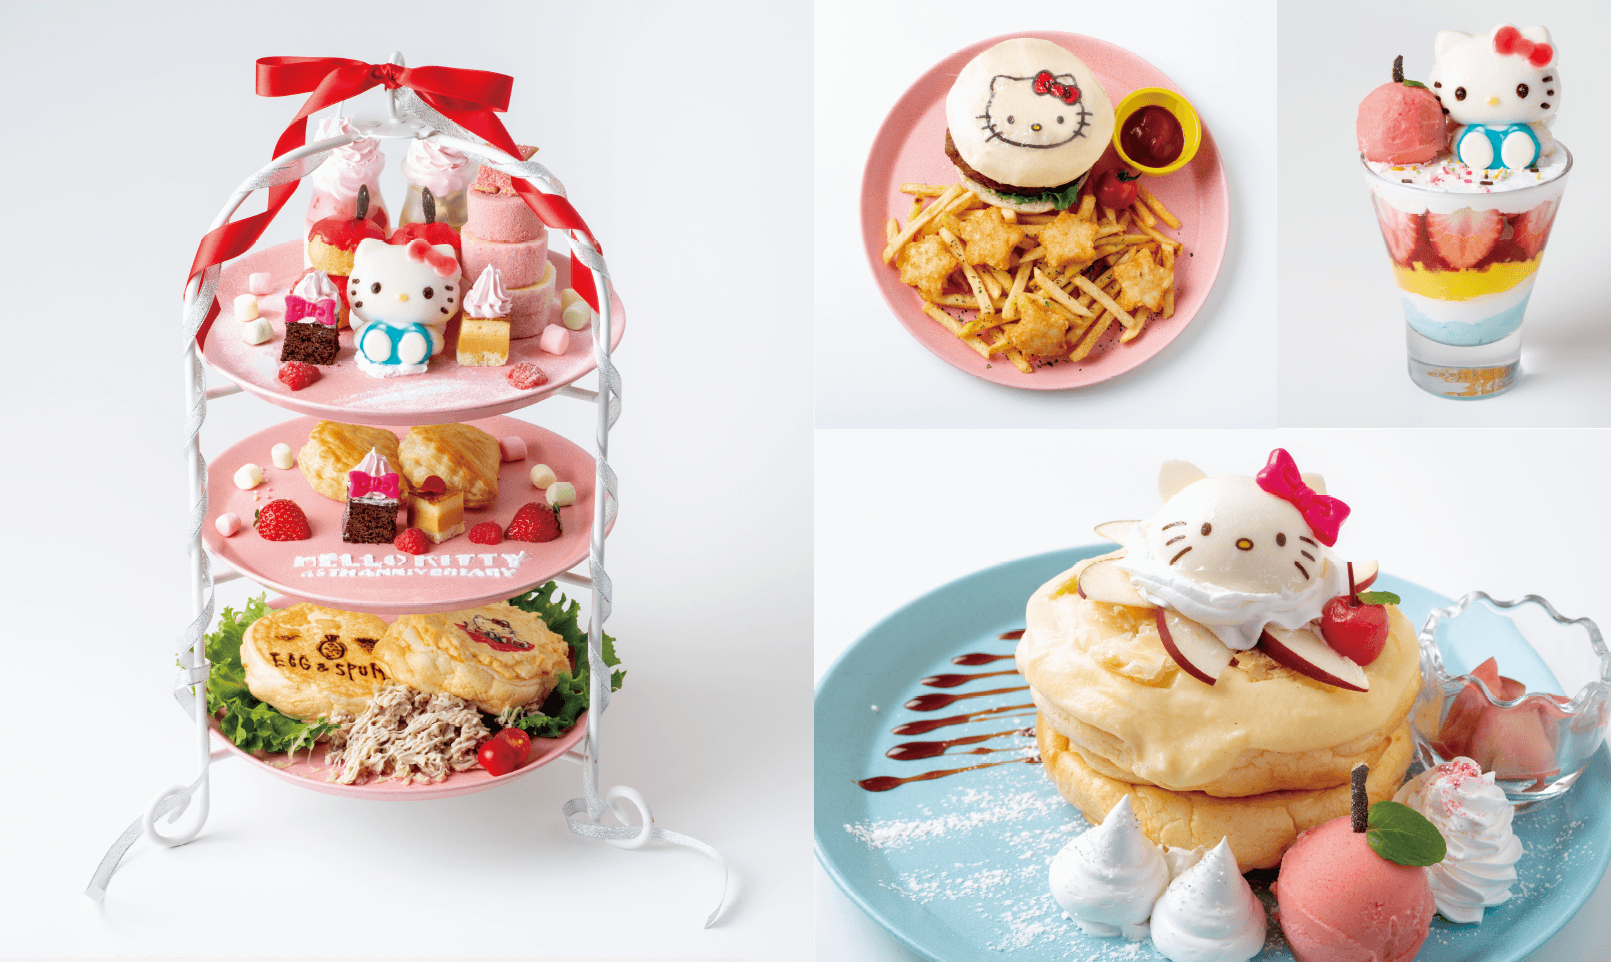 Hello Kitty誕生45週年記念協作咖啡廳於新宿 Lumine EST「EGG&SPUMA」舉行 凱蒂猫、合作、在新宿、